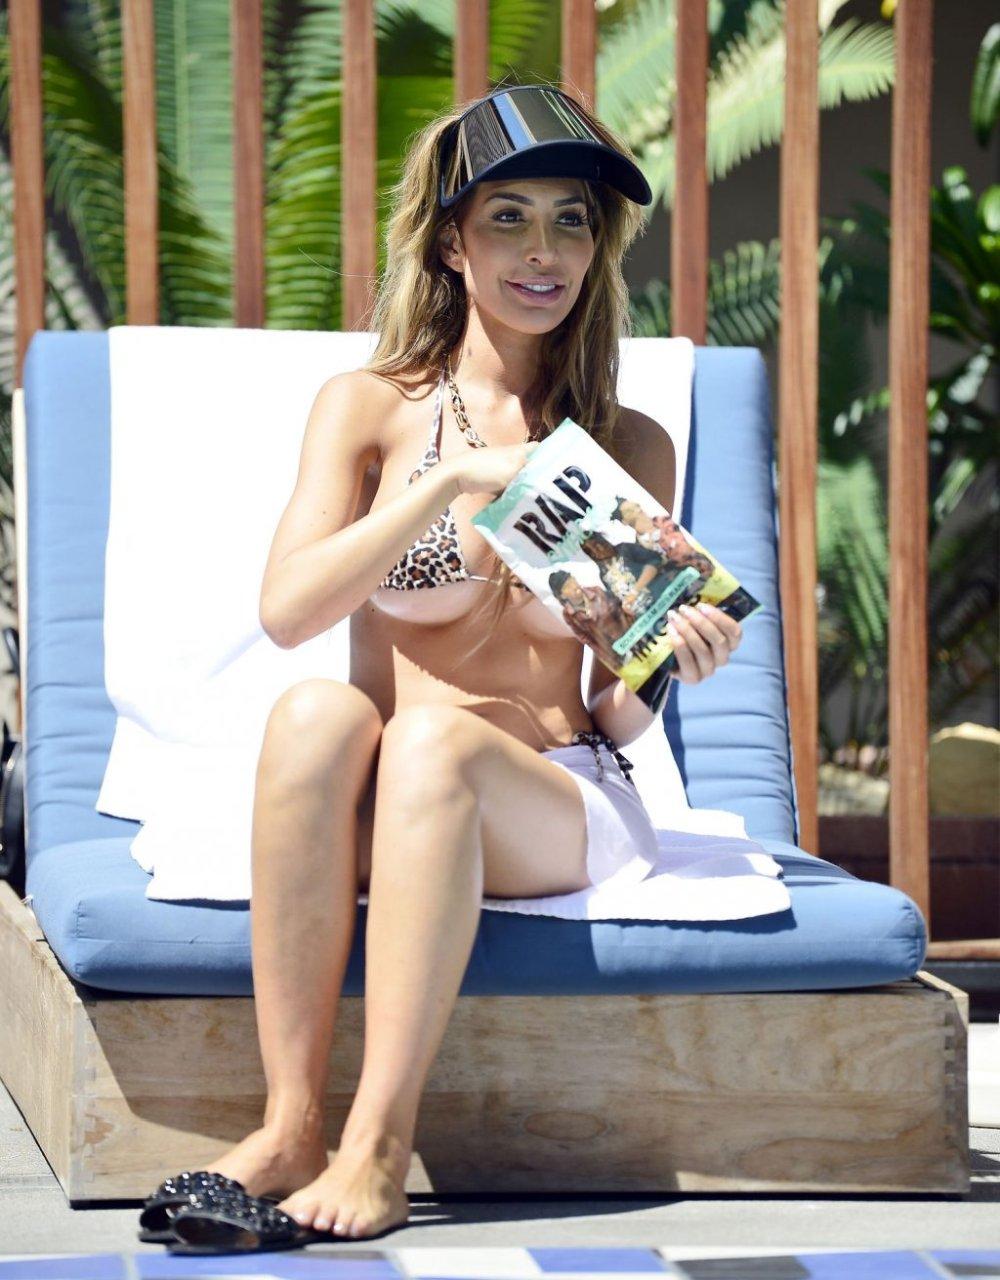 Farrah Abraham Leaked Photos farrah abraham nude photos and videos | #thefappening